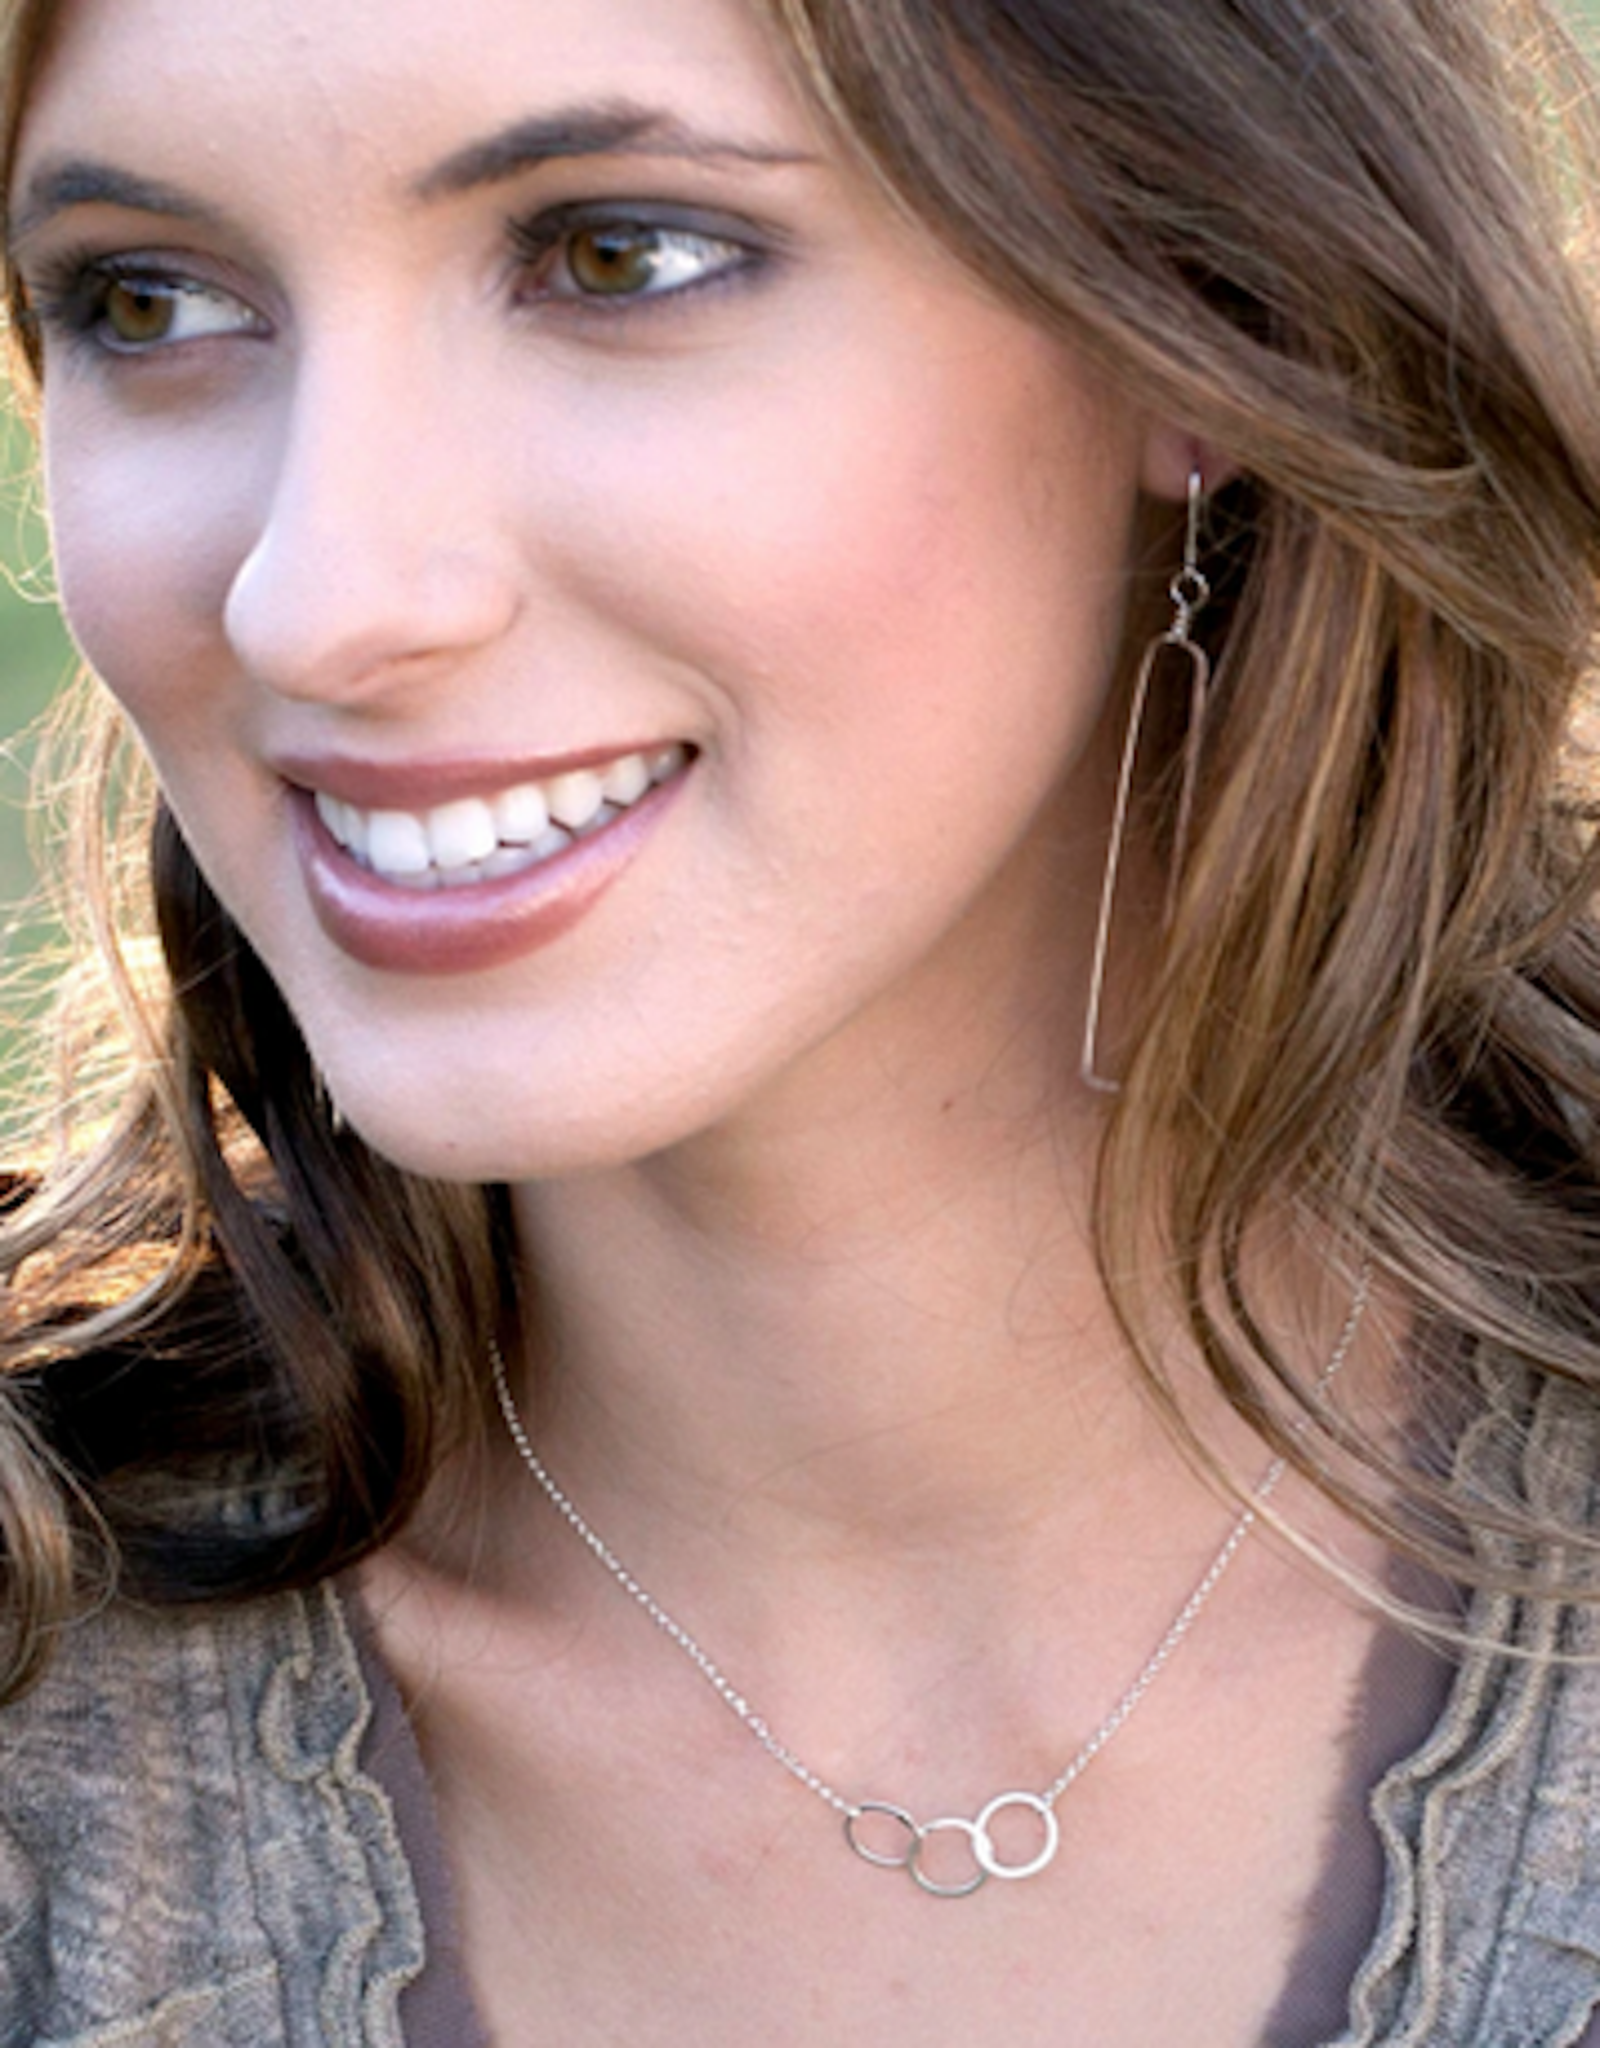 Freshie & Zero Cartwheel Necklace Silver